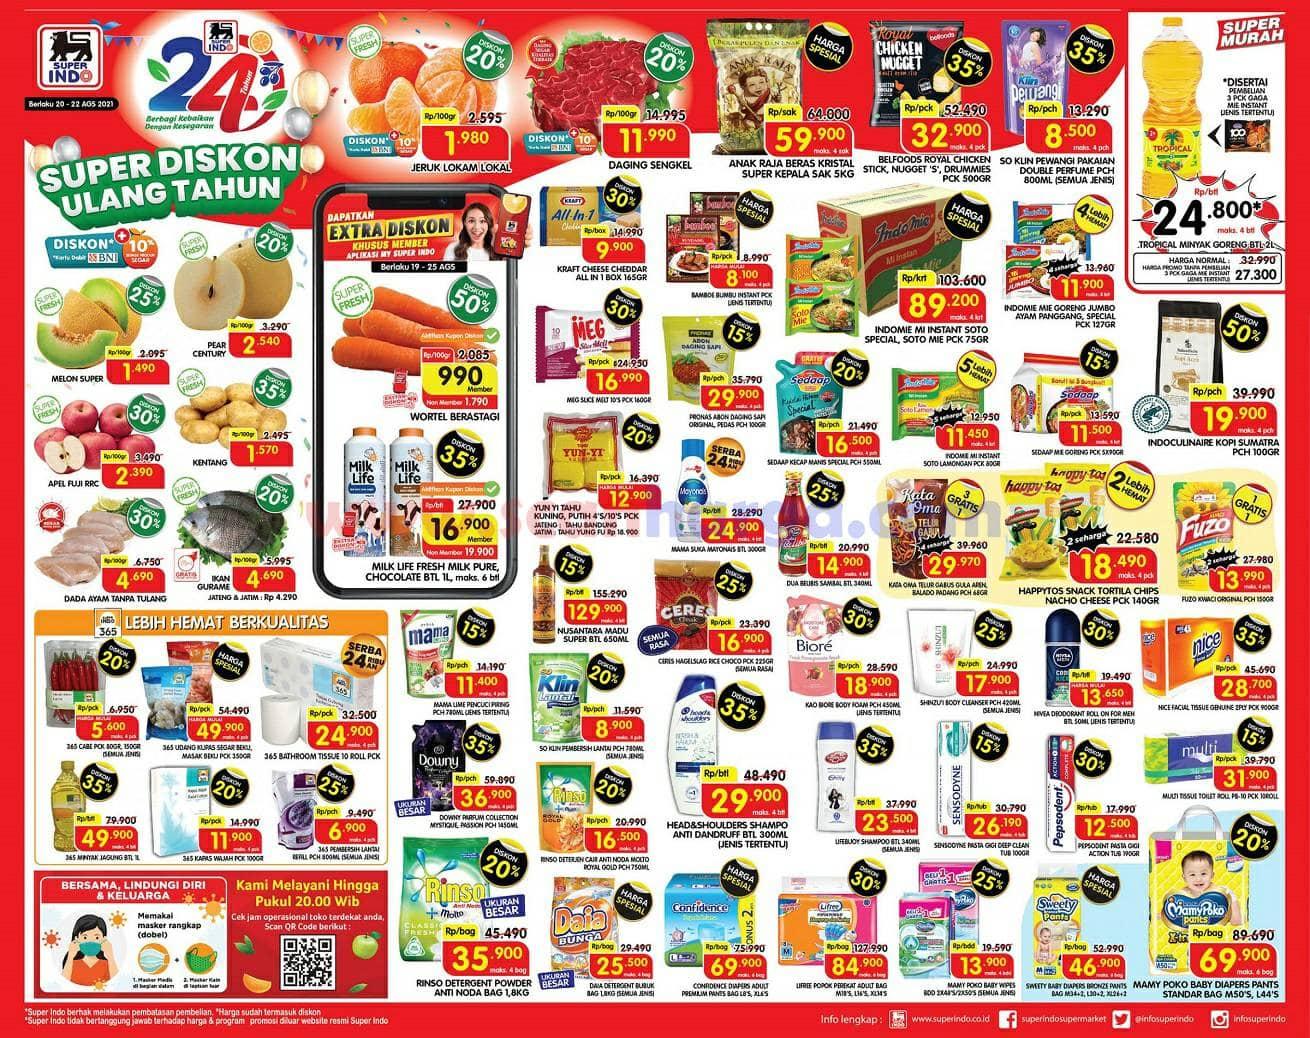 Katalog Promo Superindo Weekend Terbaru 20 - 22 Agustus 2021